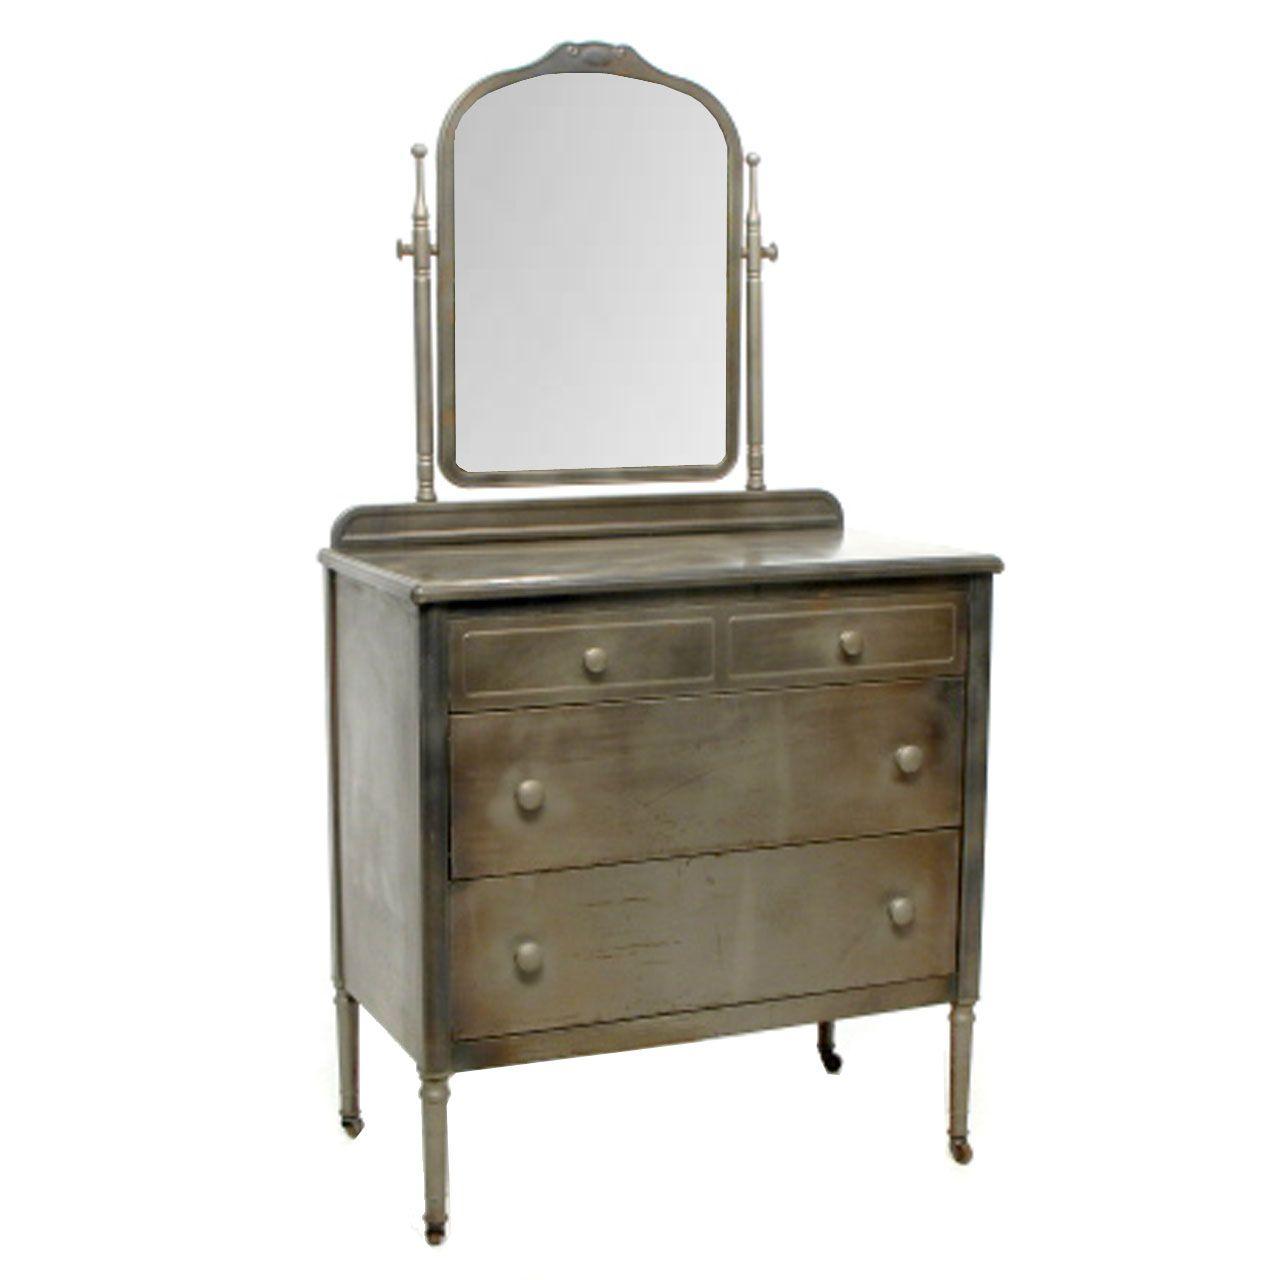 Norman Bel Geddes Industrial Antique Metal Dresser